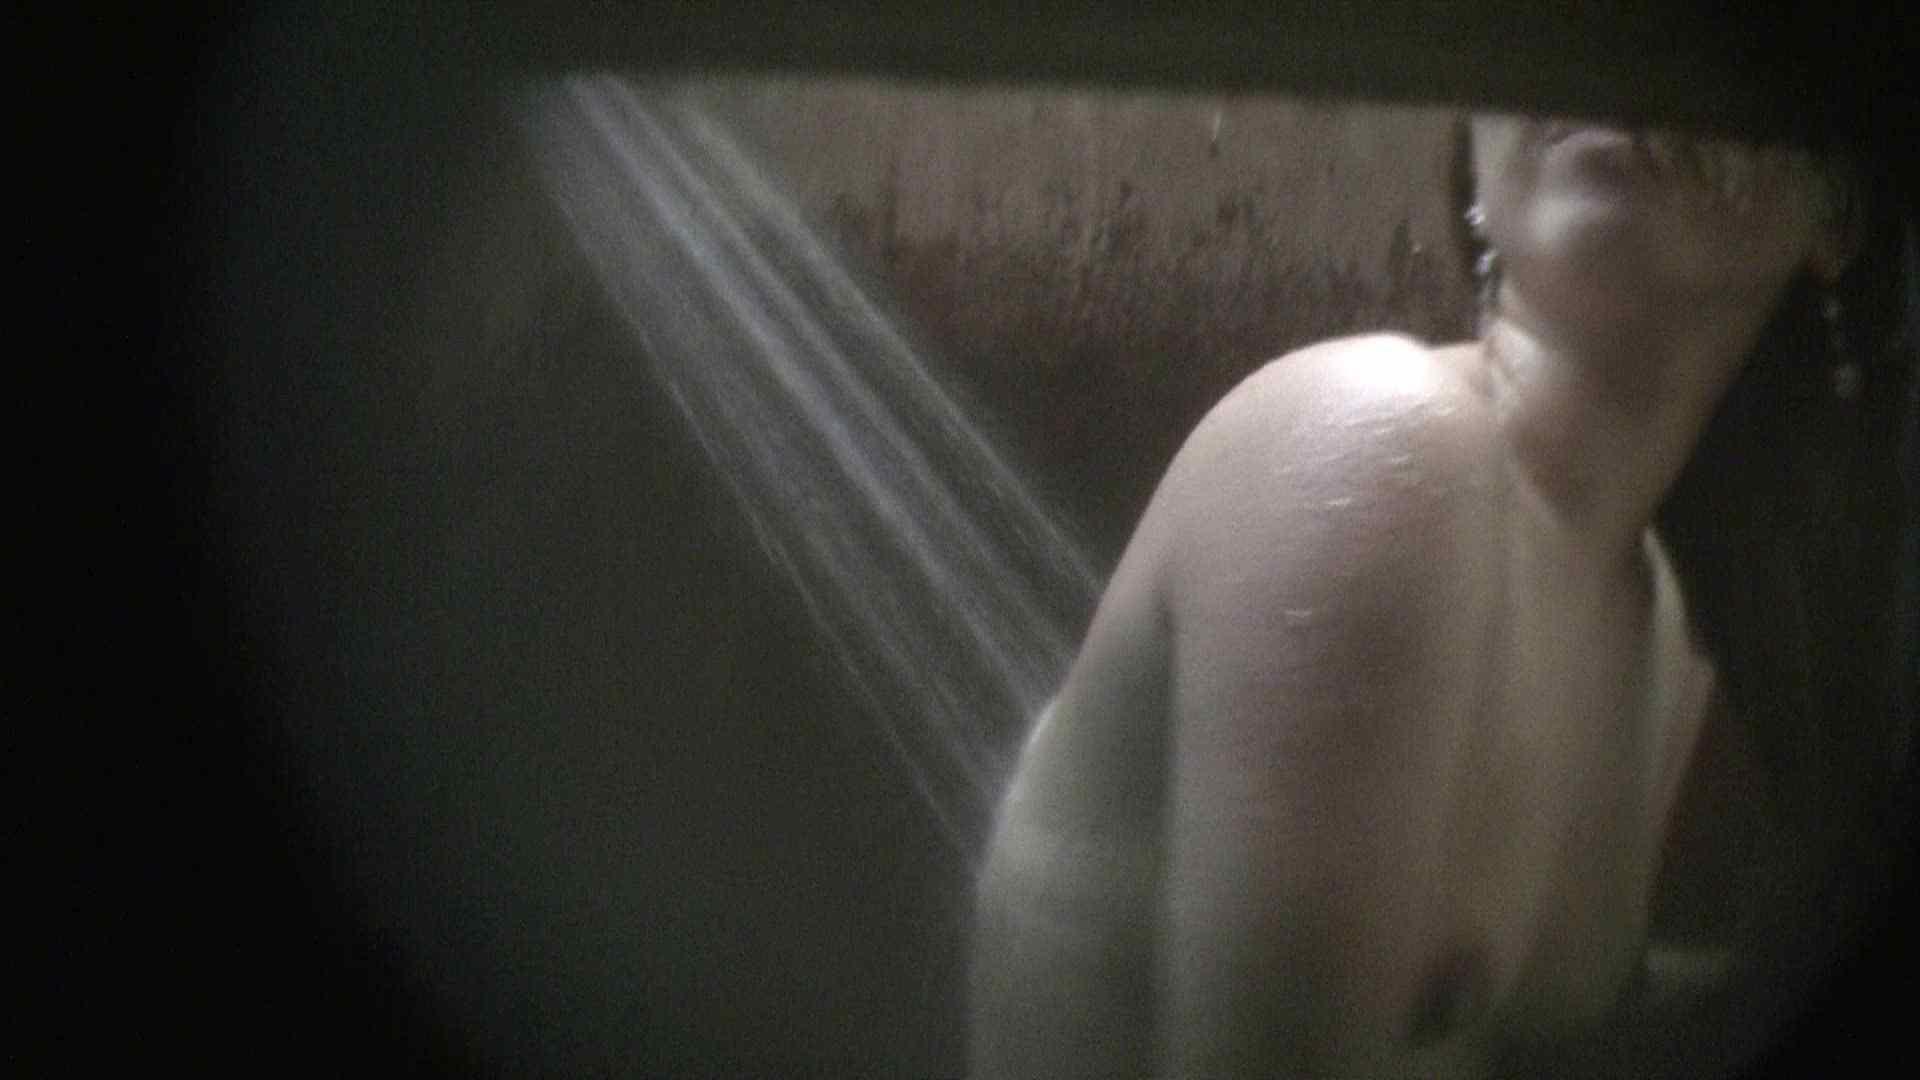 NO.03 ムッチリ色白ボディーに少し大きな乳輪 覗き特集   シャワー室  82PIX 37